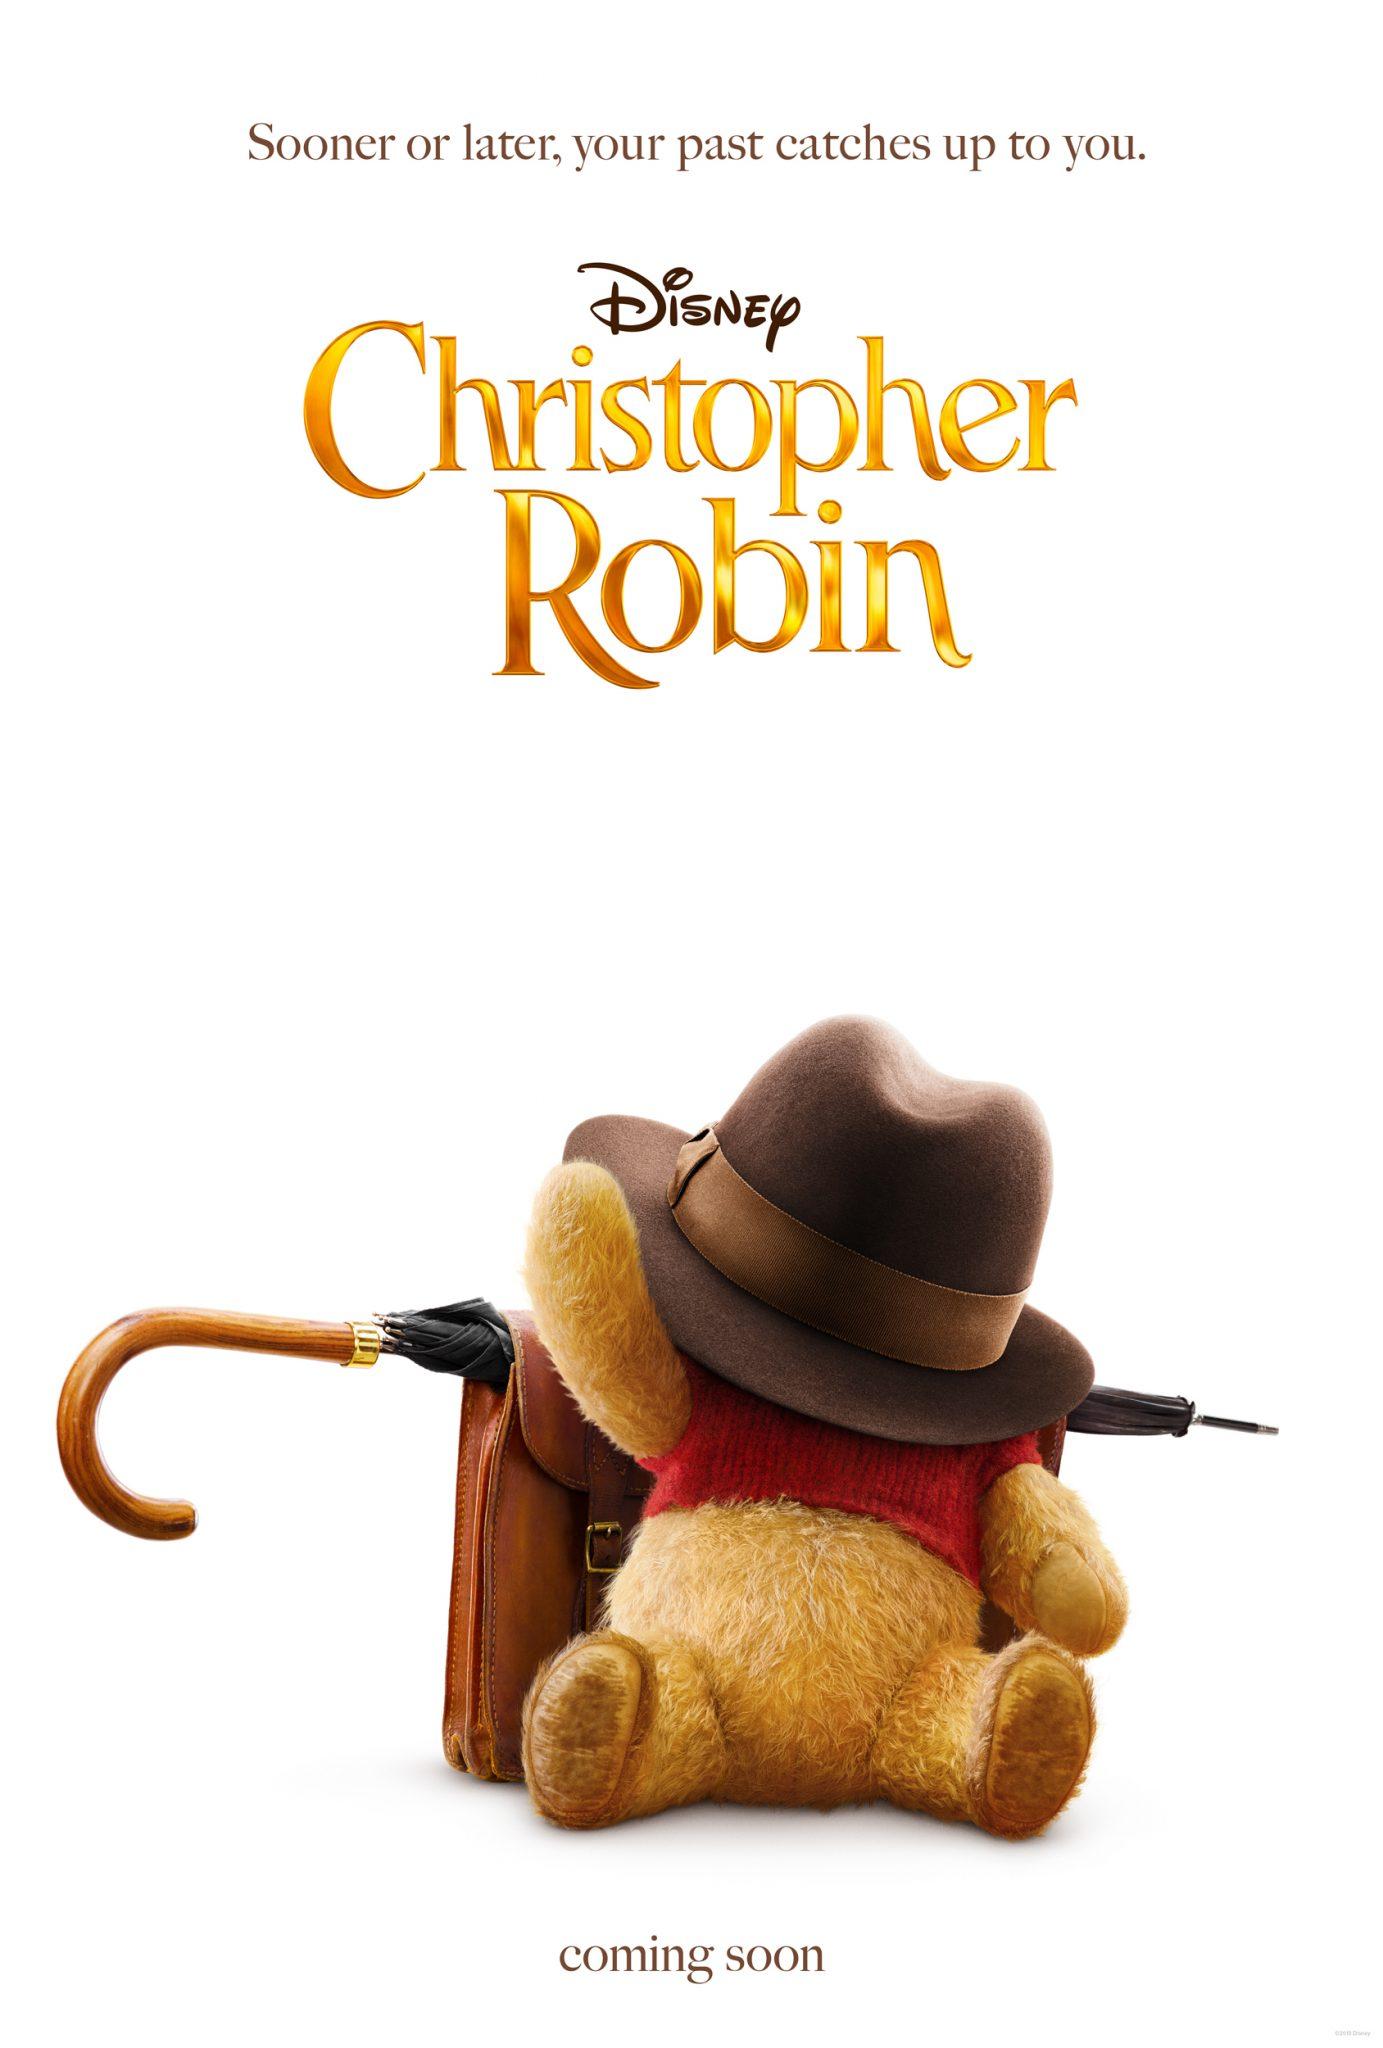 First Look: Disney Christopher Robin